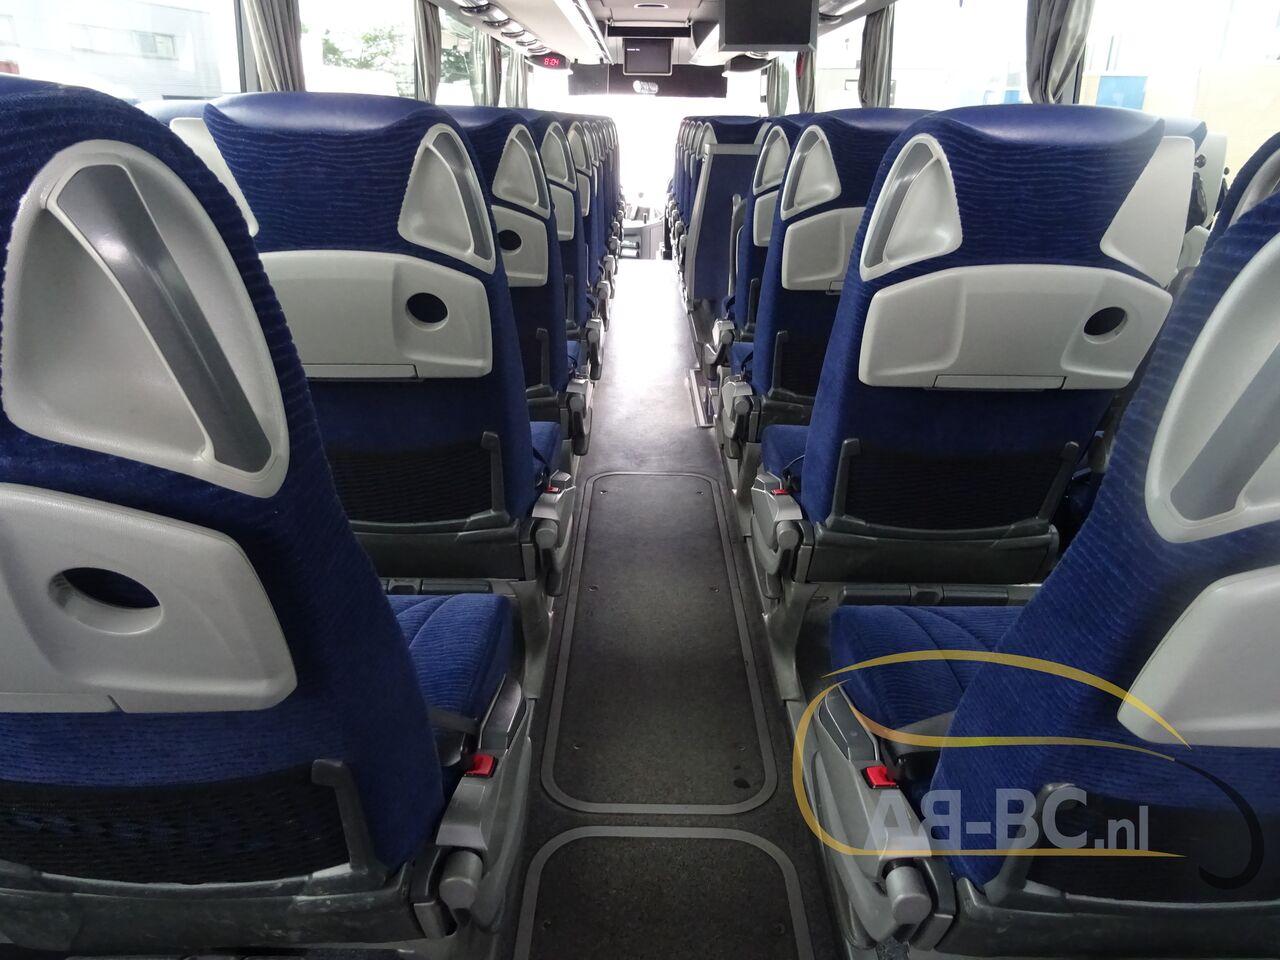 coach-busSETRA-S415-GT-HD-FINAL-EDITION---1627457291560832412_big_994020e019fa1dc629723747fa3af5f3--21050713010665719300